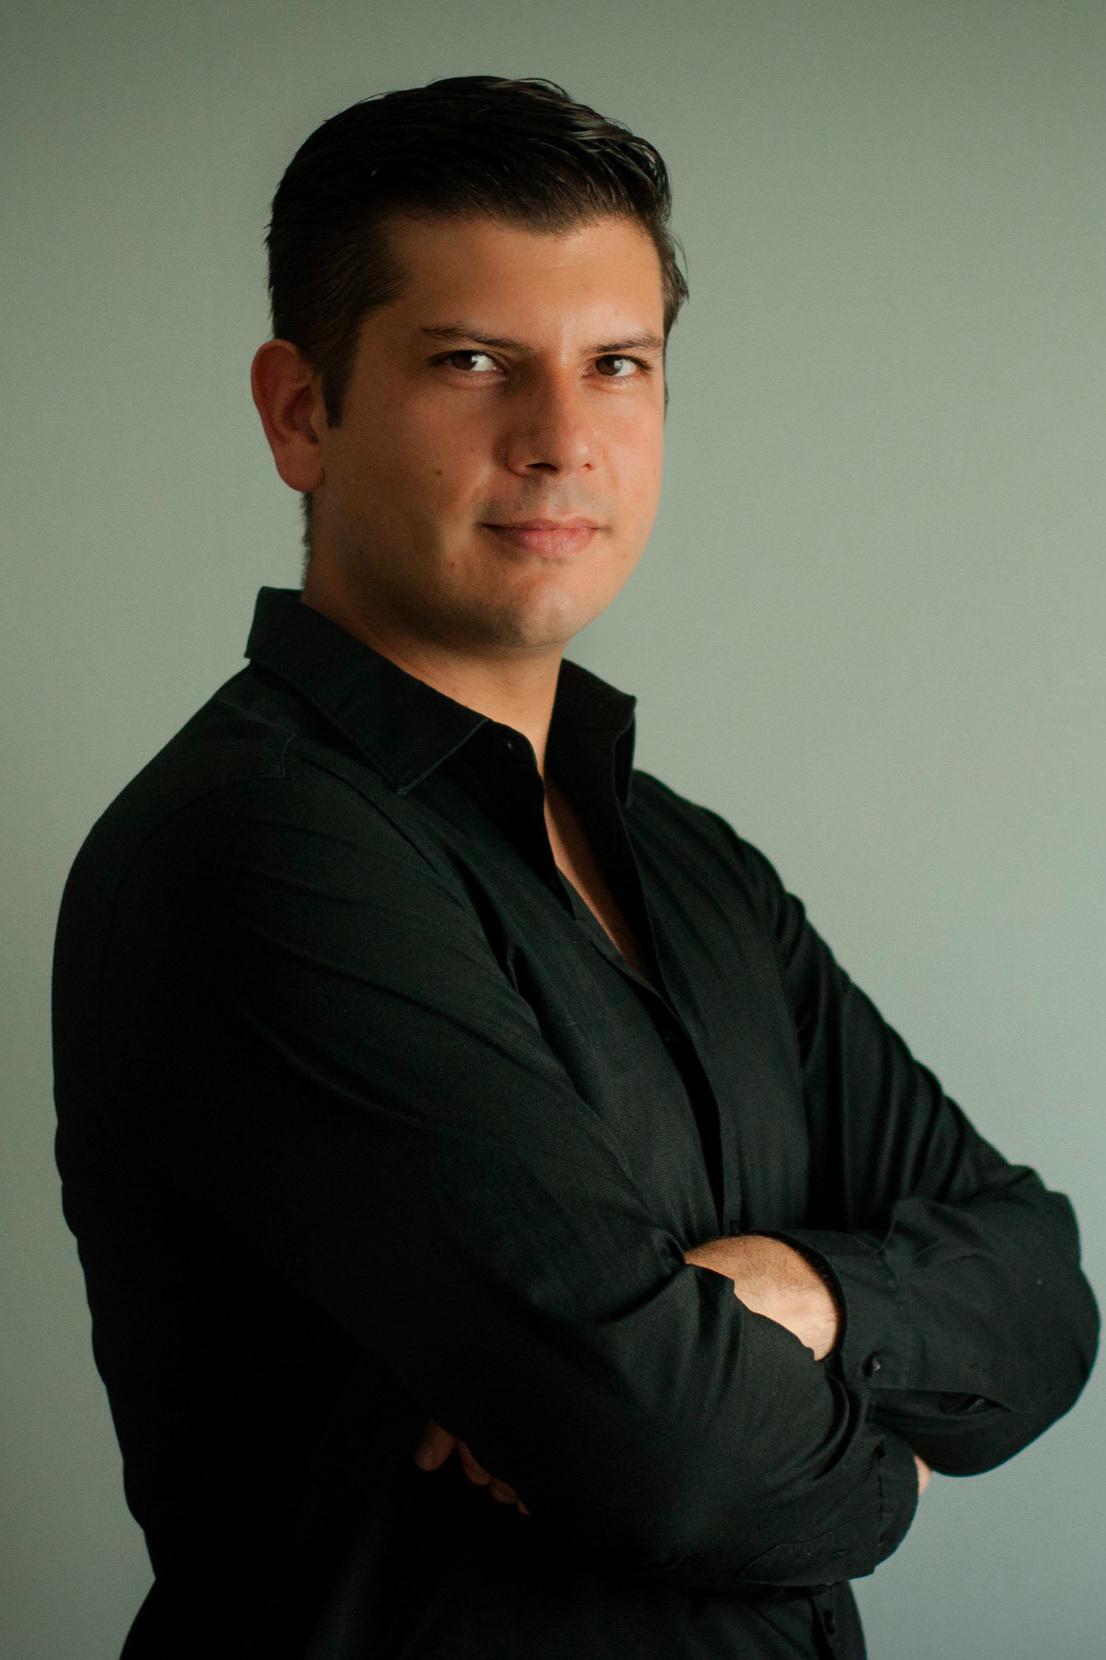 Felipe Luksic - Asesor InmobiliarioIdiomas: Español / Inglesfelipe@selvacorealty.com